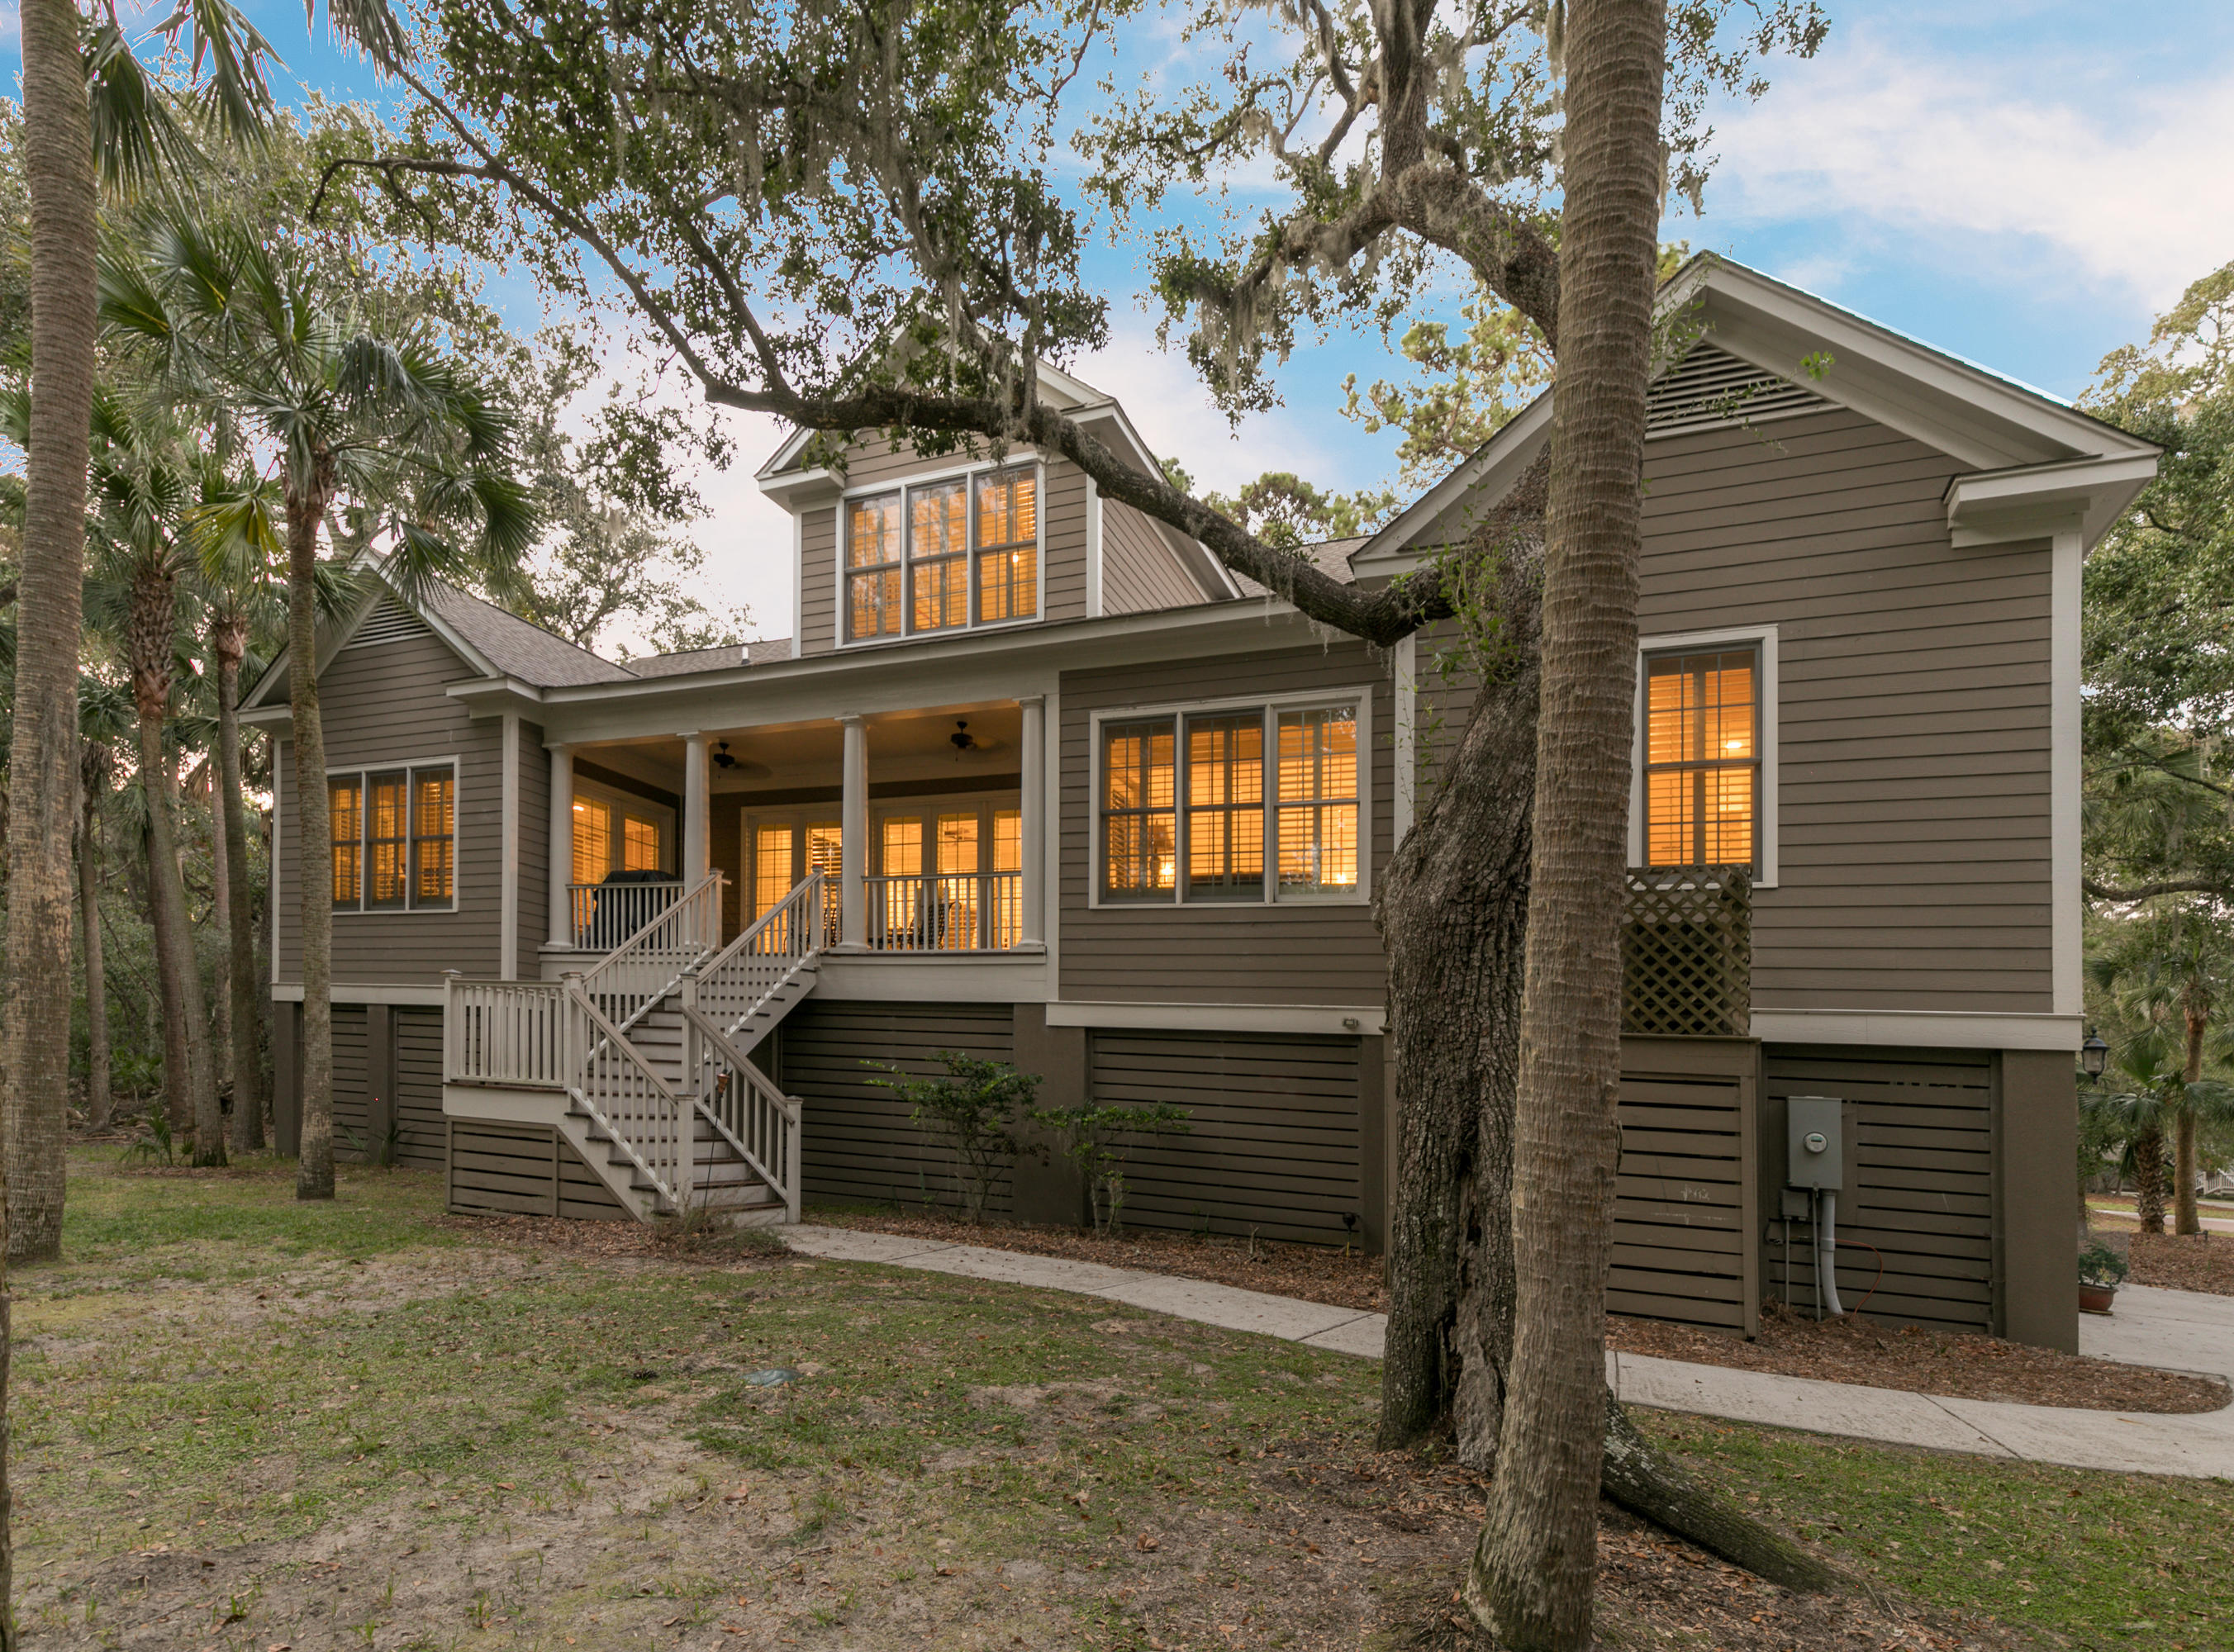 Seabrook Island Homes For Sale - 2701 Seabrook Island, Seabrook Island, SC - 44